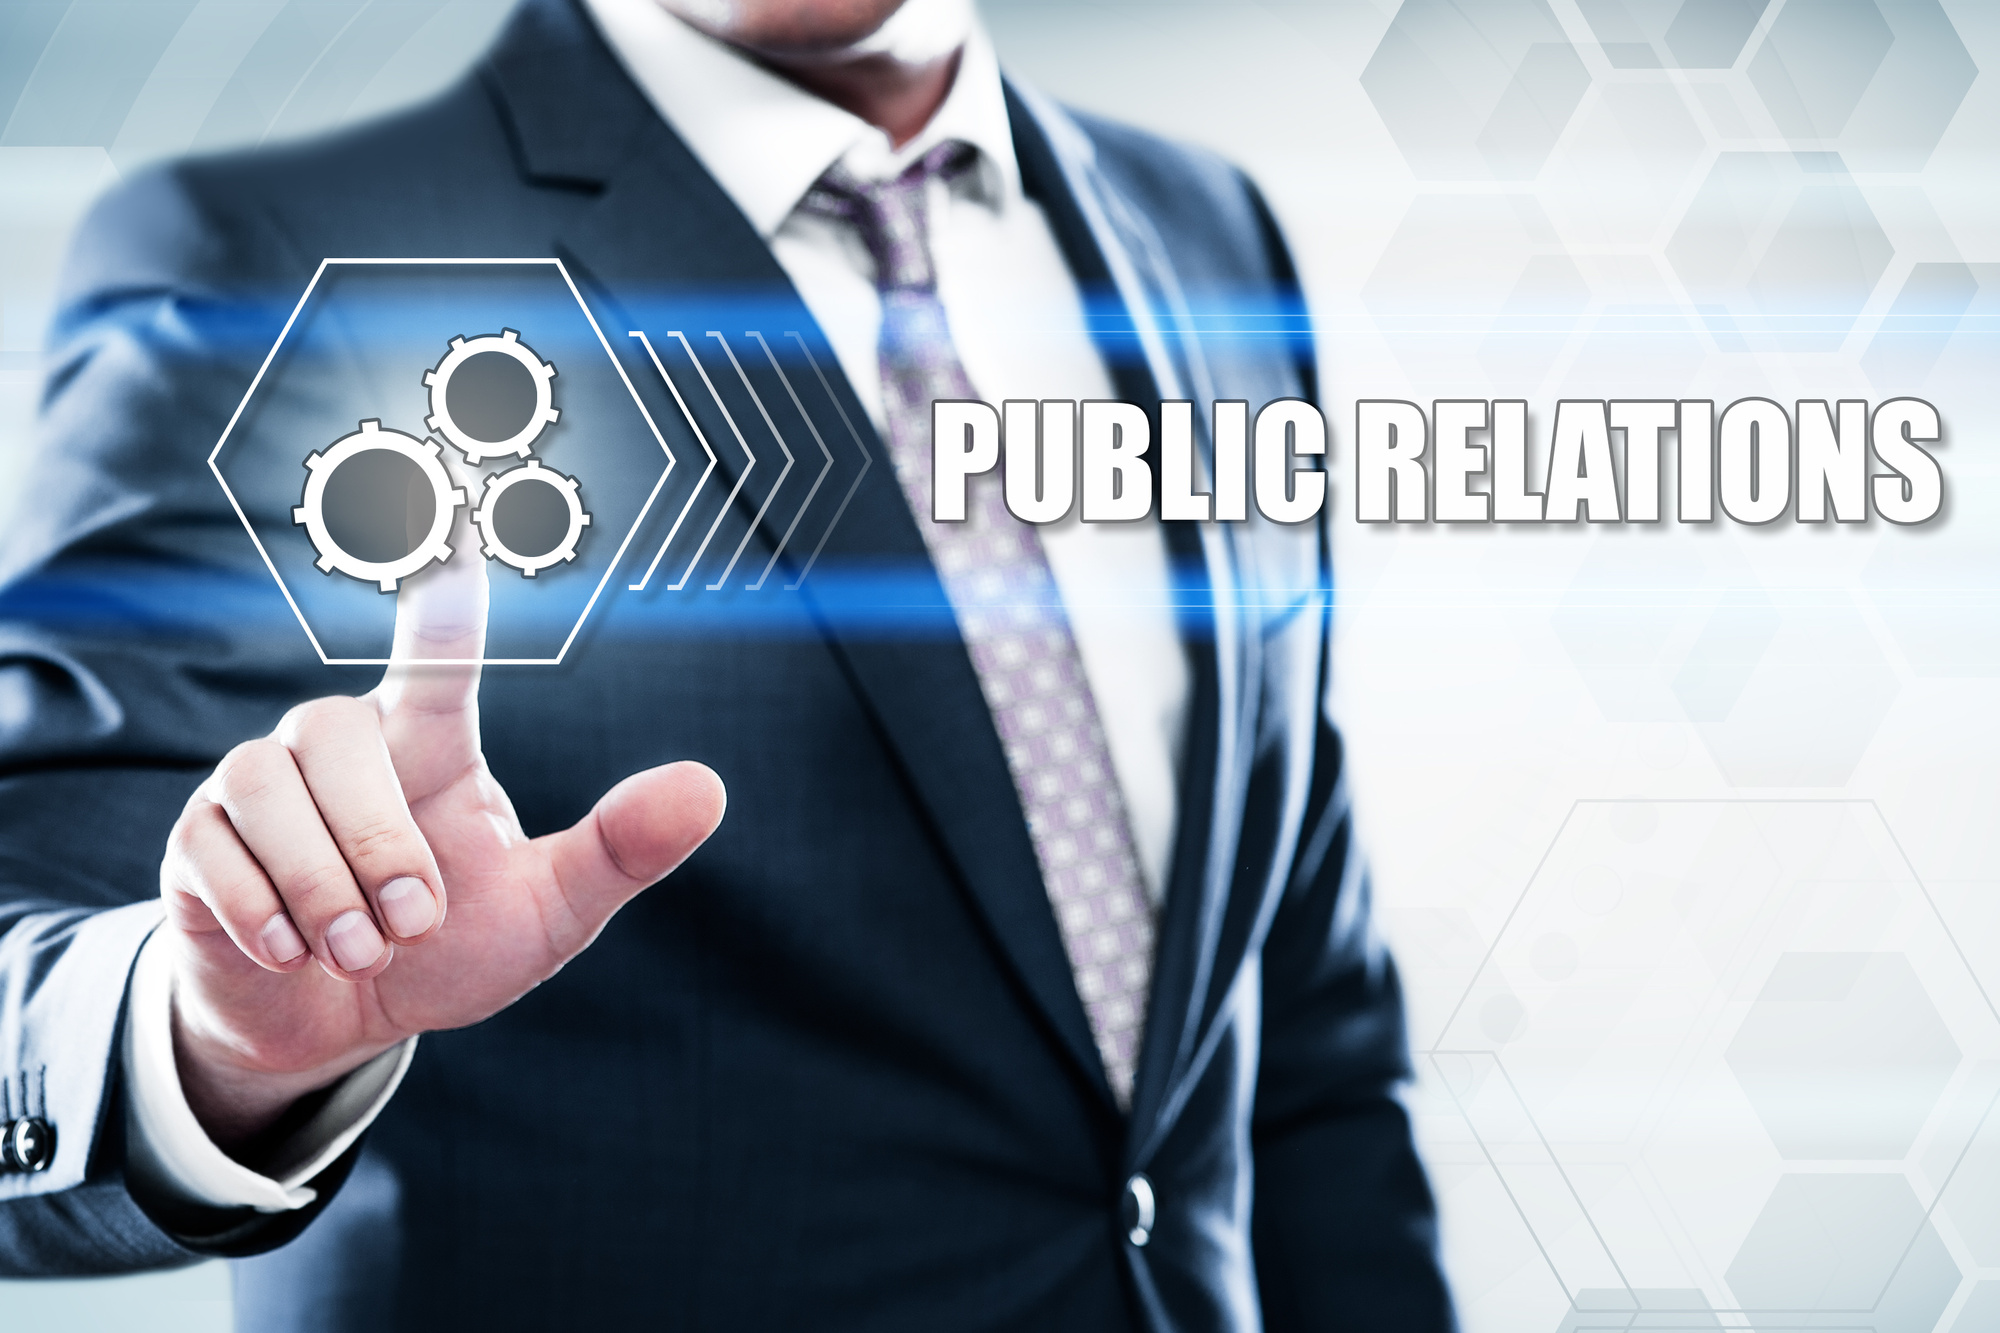 digital public relations